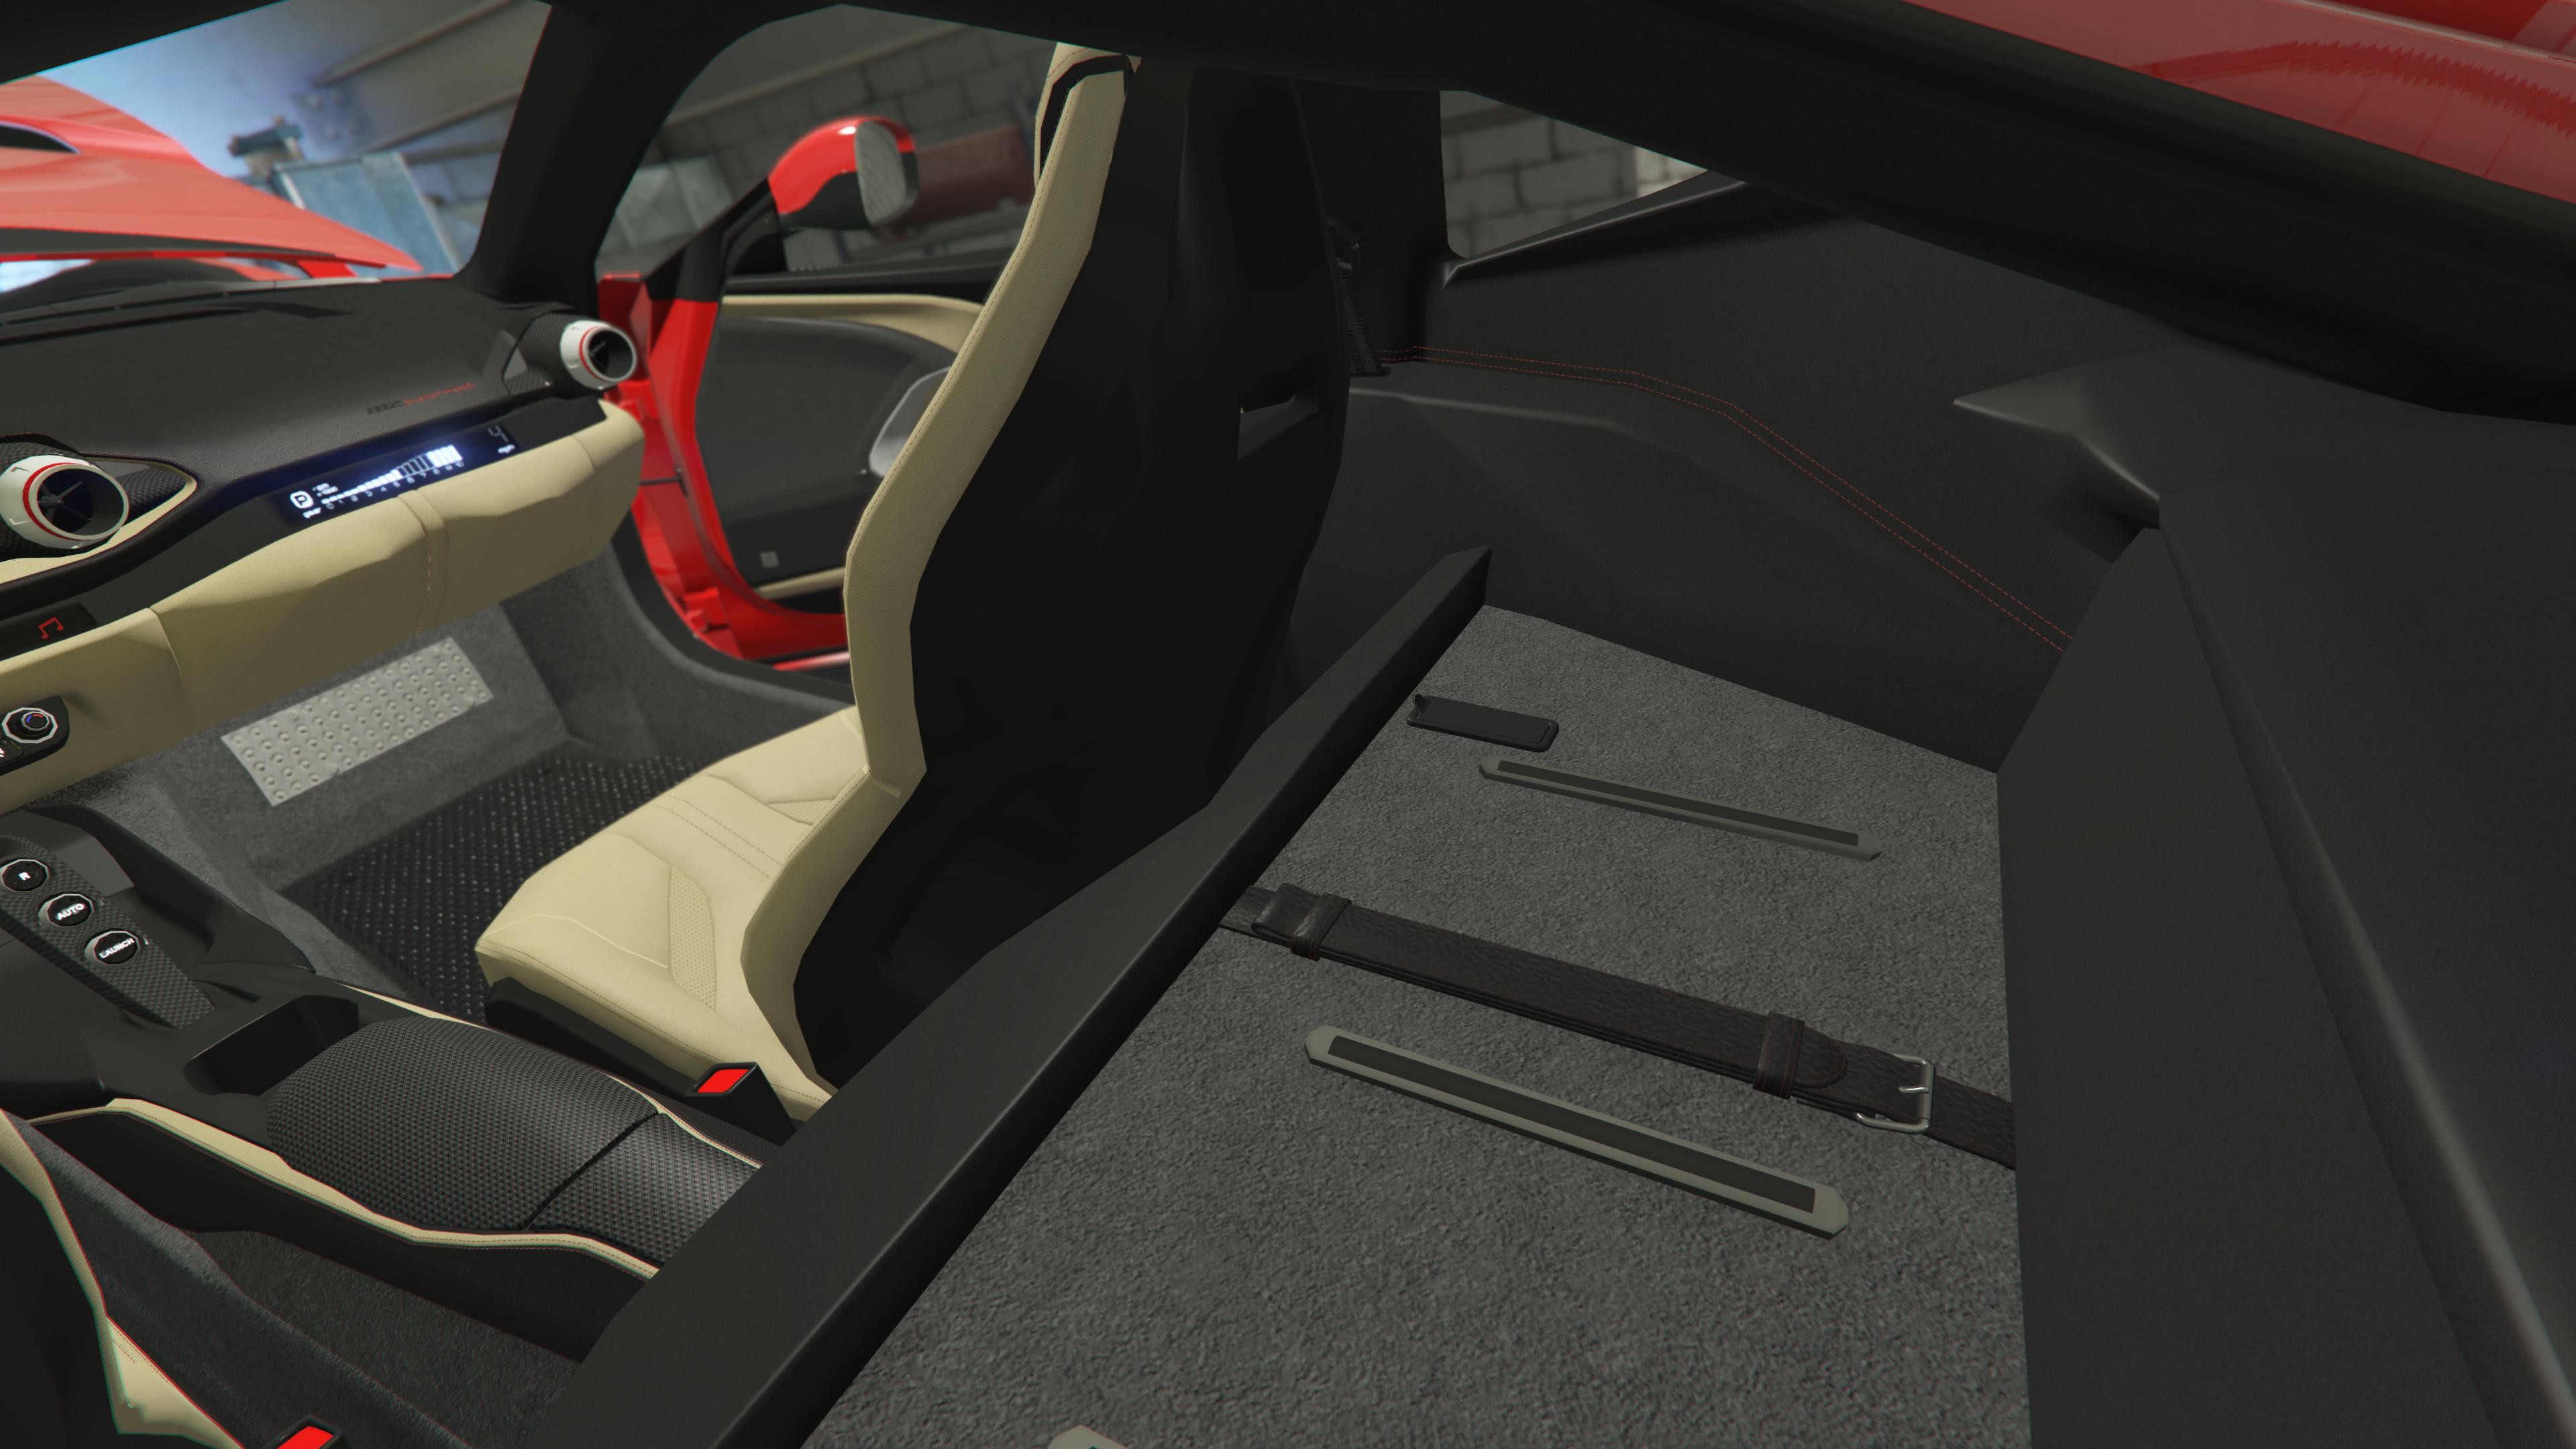 2018 Ferrari 812 Superfast Livery Add On Replace Gta5 Mods Com